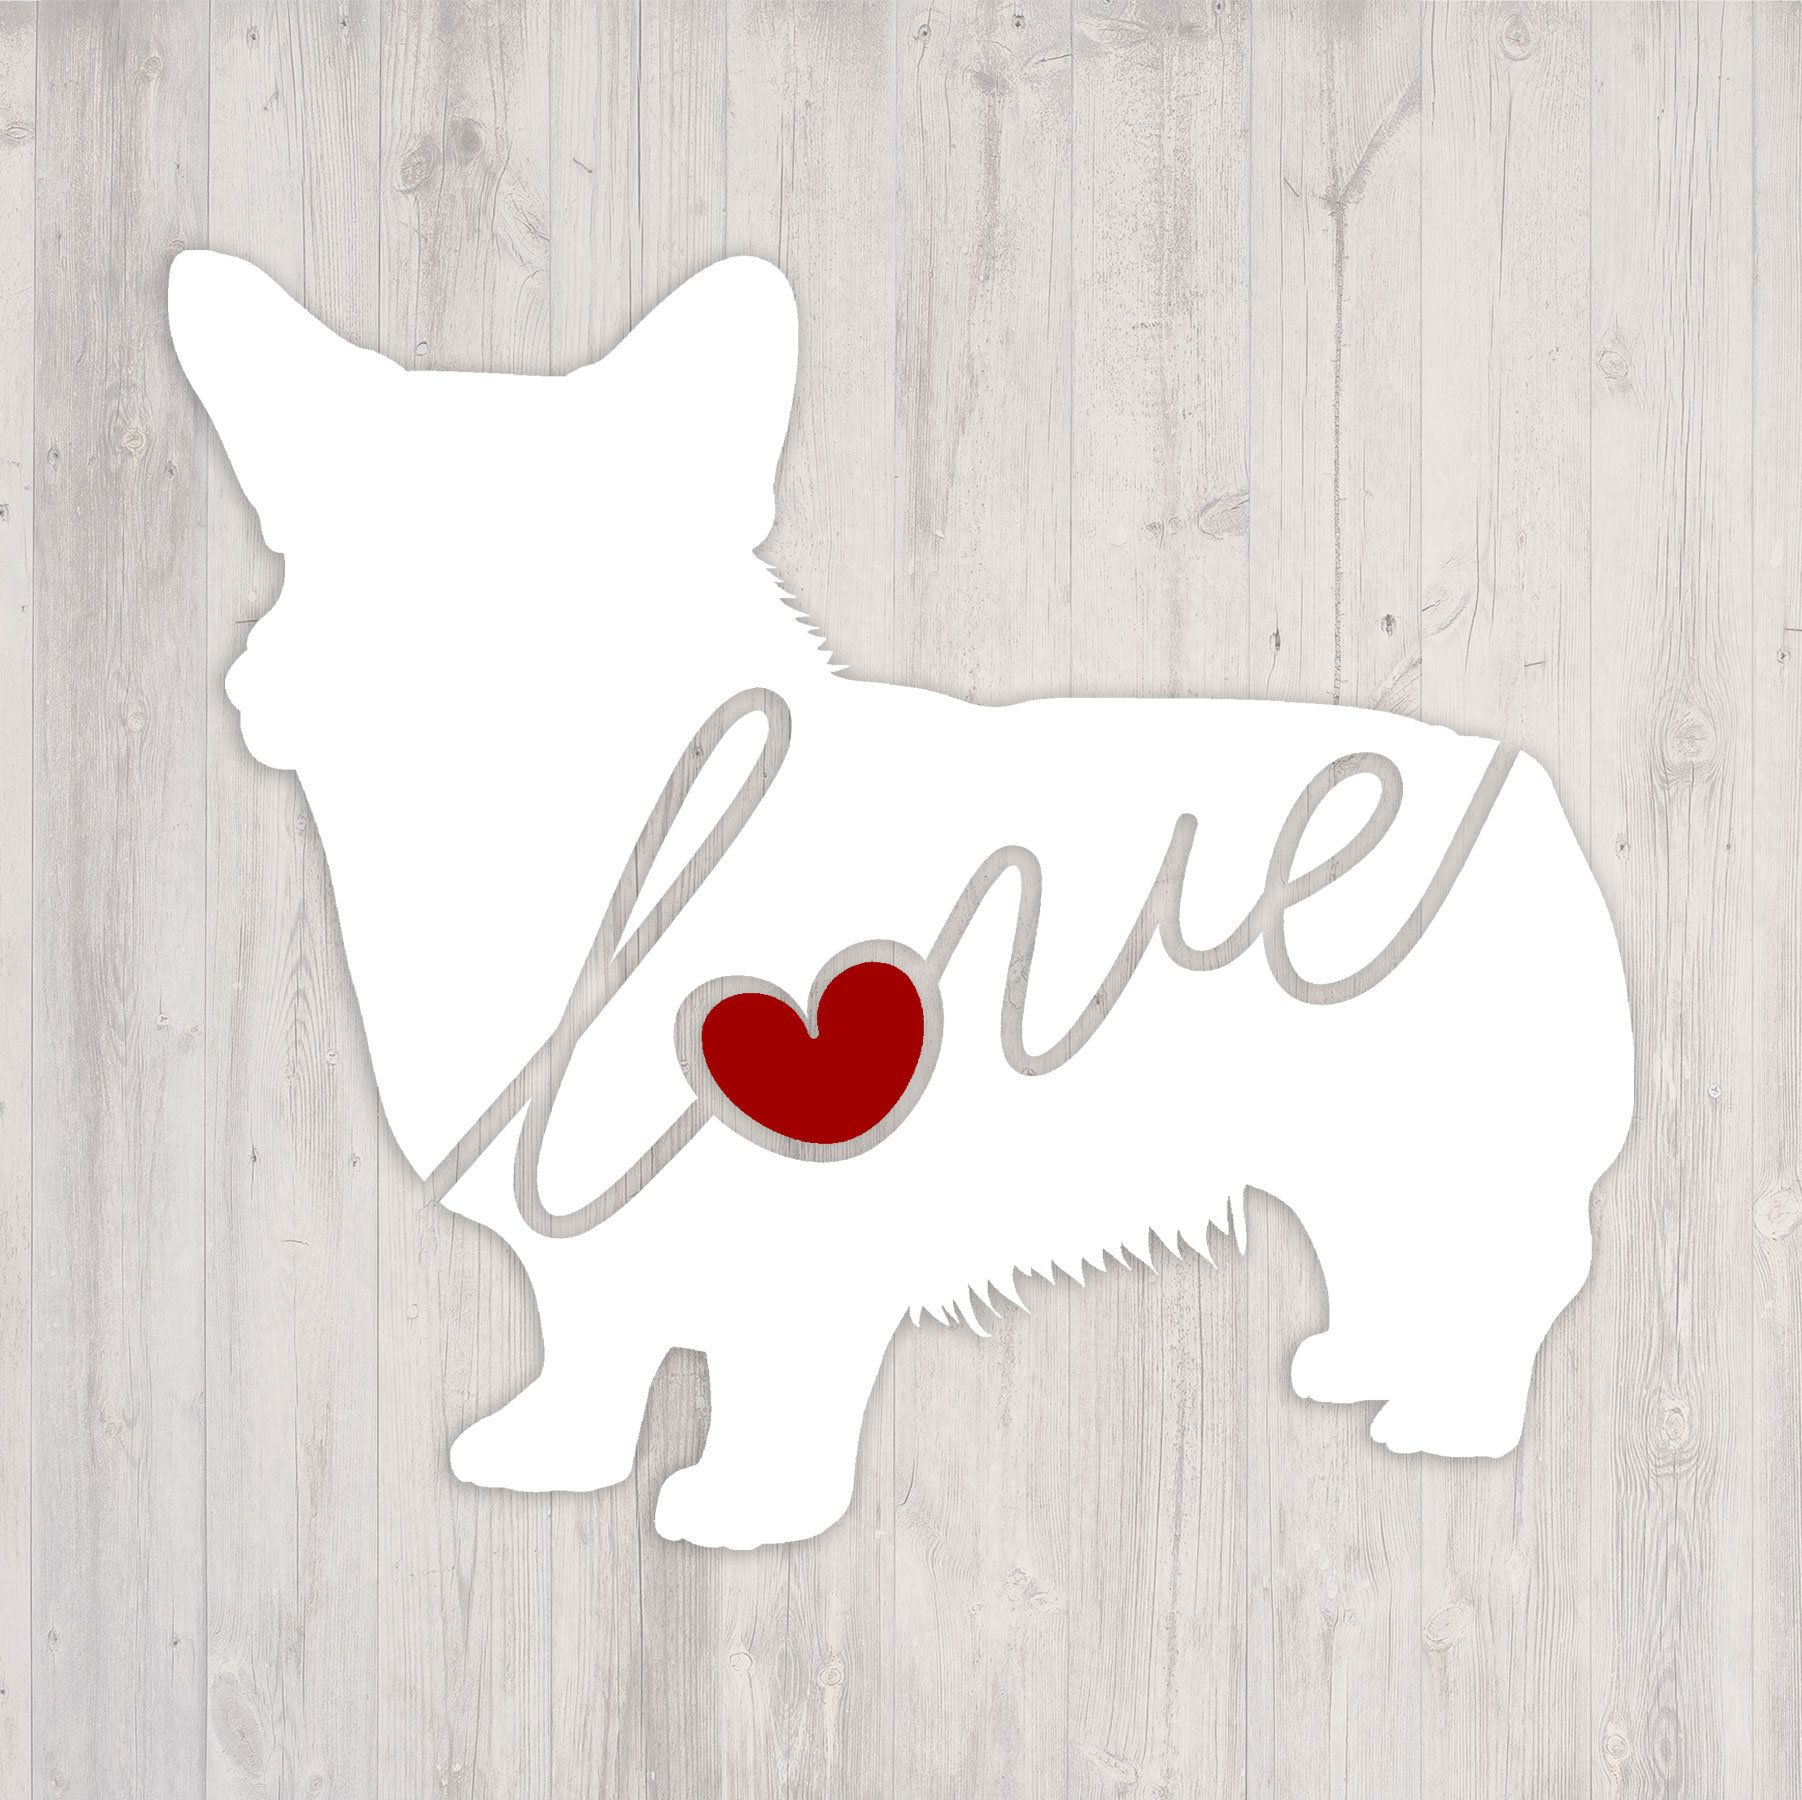 Welsh Corgi Love A Car Window Vinyl Decal Laptop Sticker Dog Breed Decals Dog Stickers Cooler Decal Gift F Dog Breed Decal Dog Gifts Dog Lover Gifts [ 1800 x 1802 Pixel ]